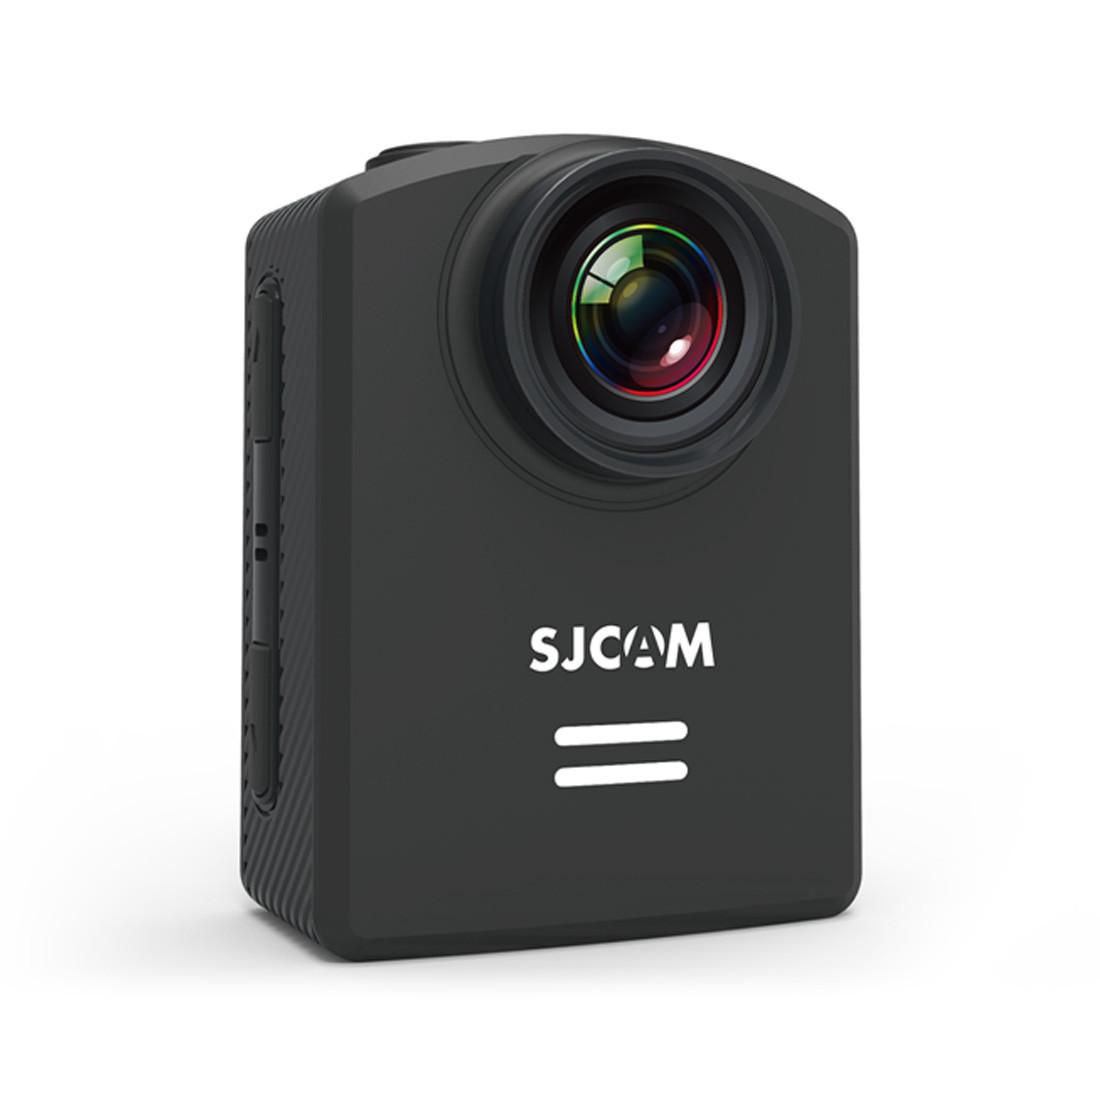 Экшн-камера SJCAM M20 (Black)